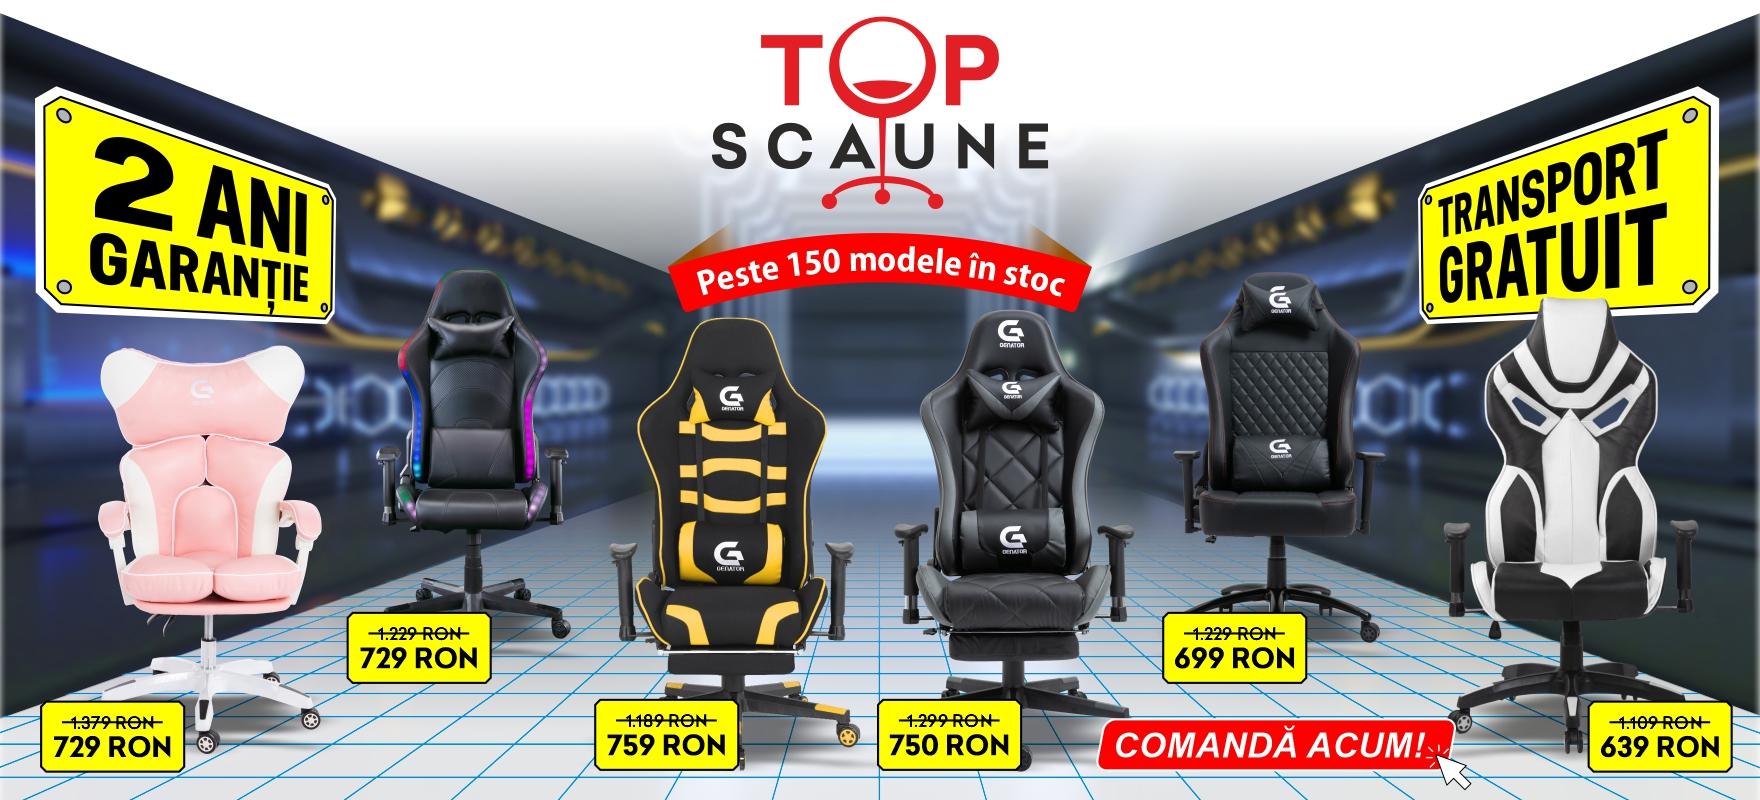 topscaune banner site 202104 white 3 - TopScaune: Magazin Online de Scaune